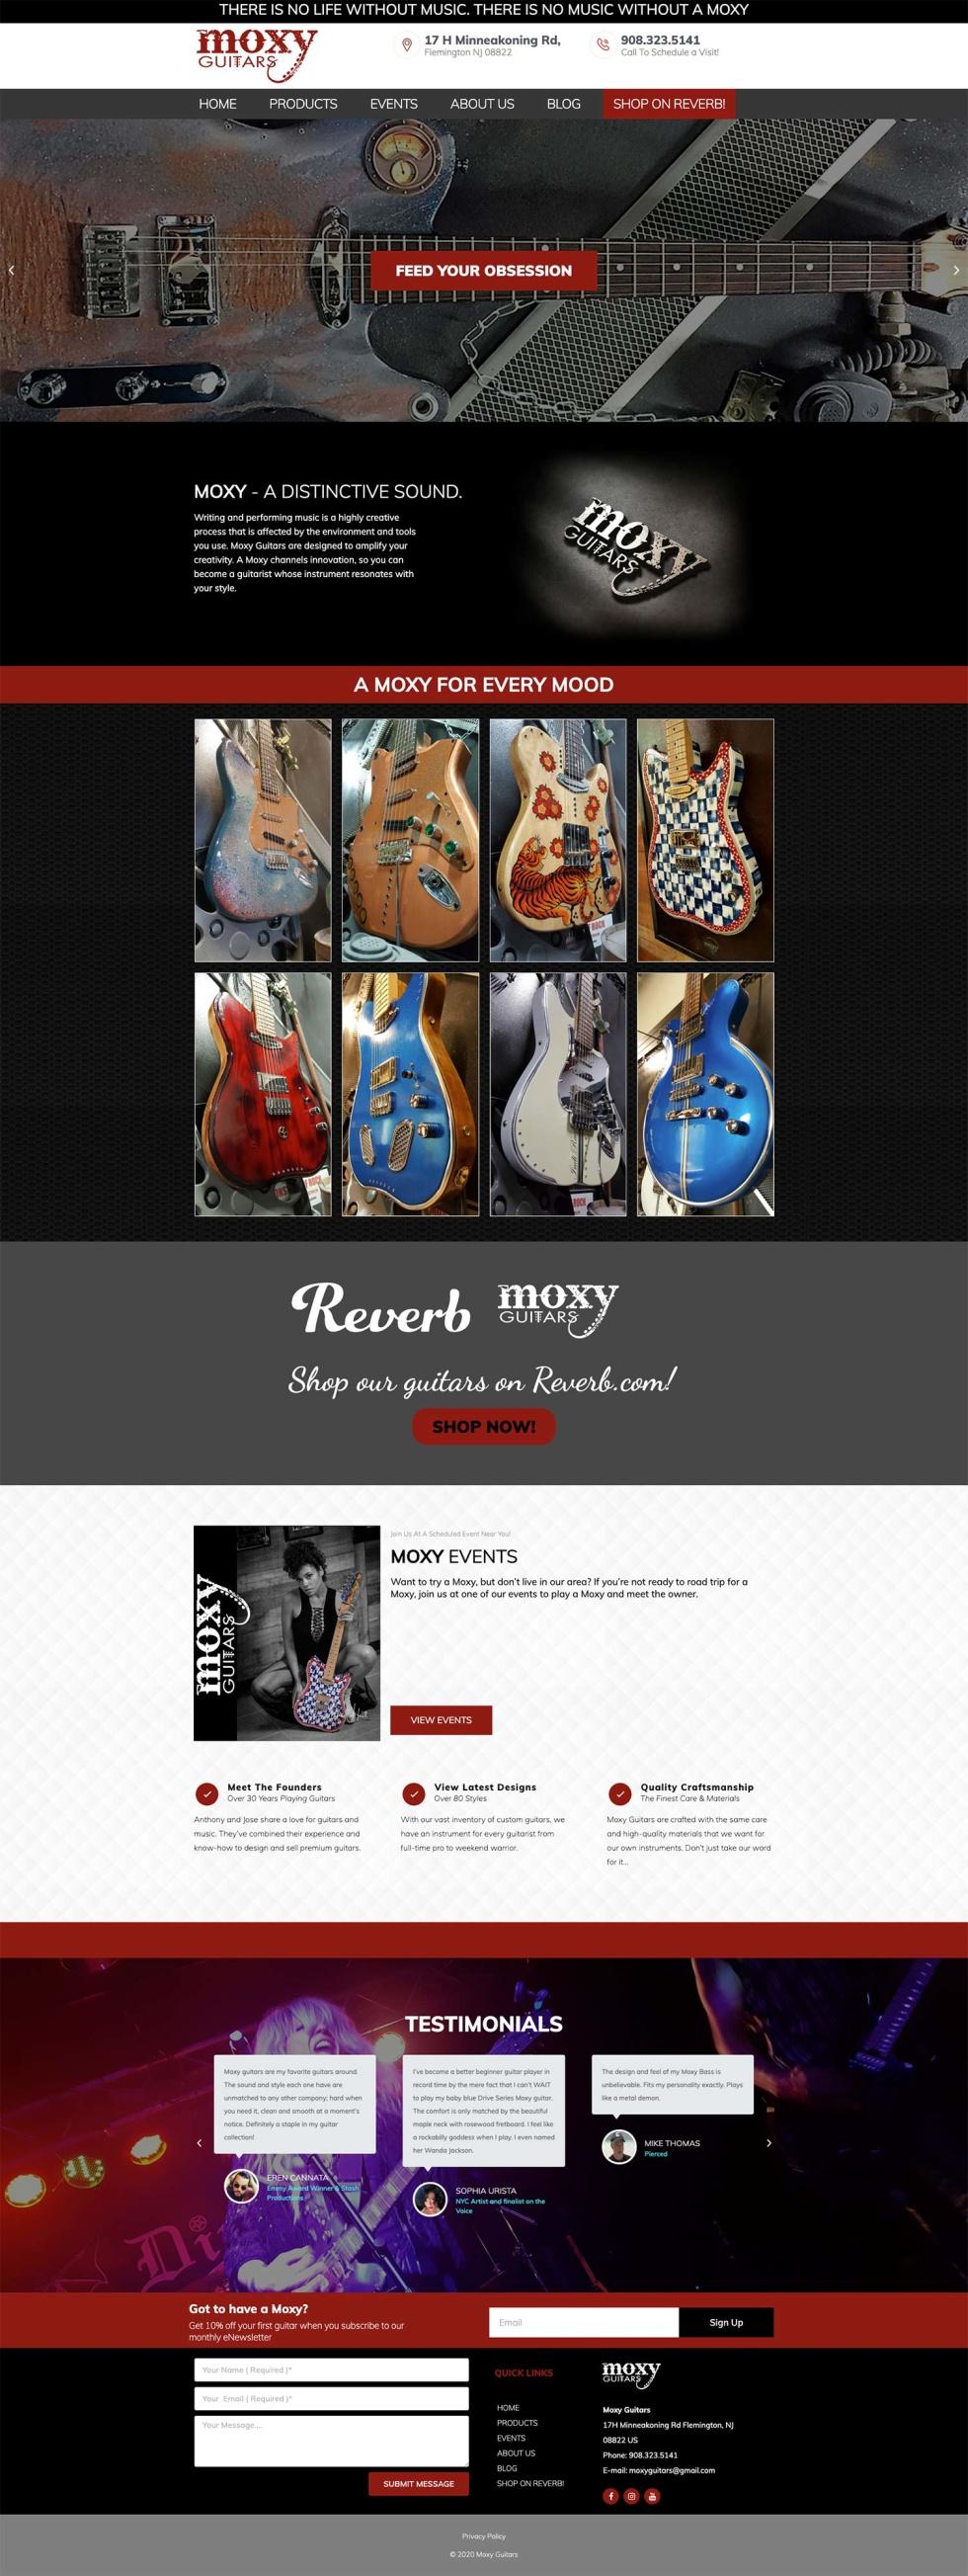 Custom website design for guitar store